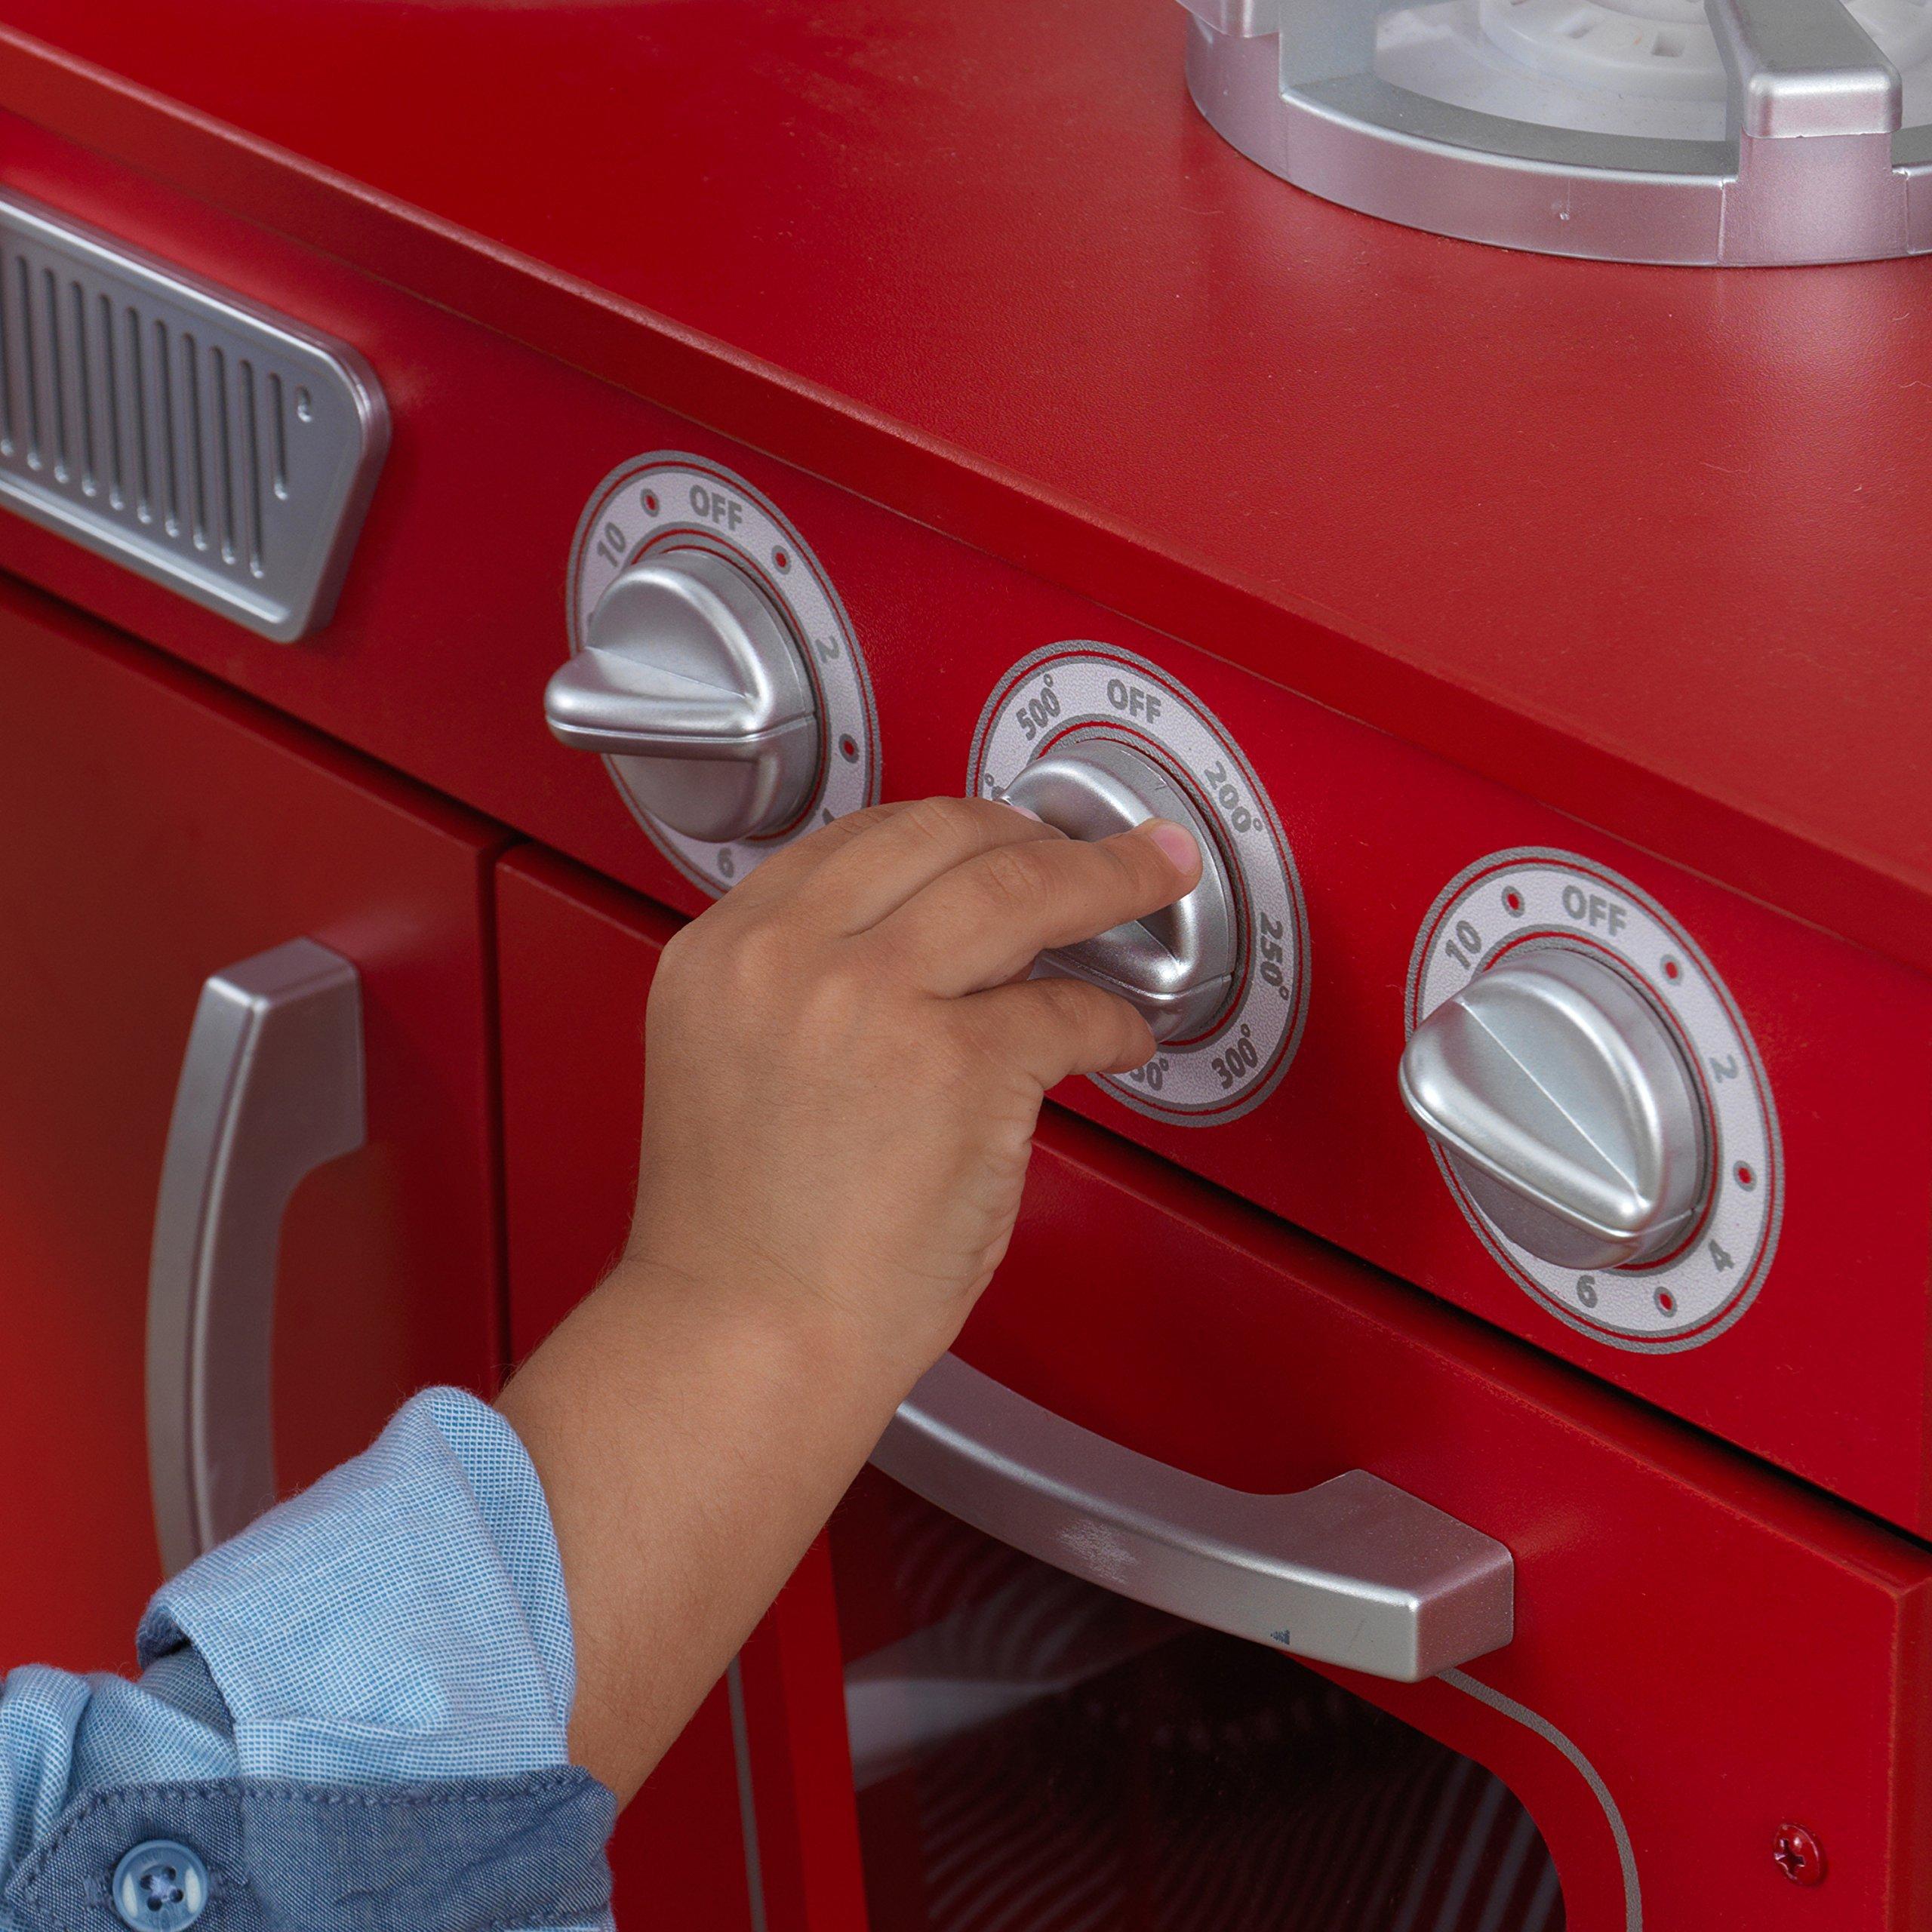 KidKraft Vintage Play Kitchen - Red by KidKraft (Image #8)